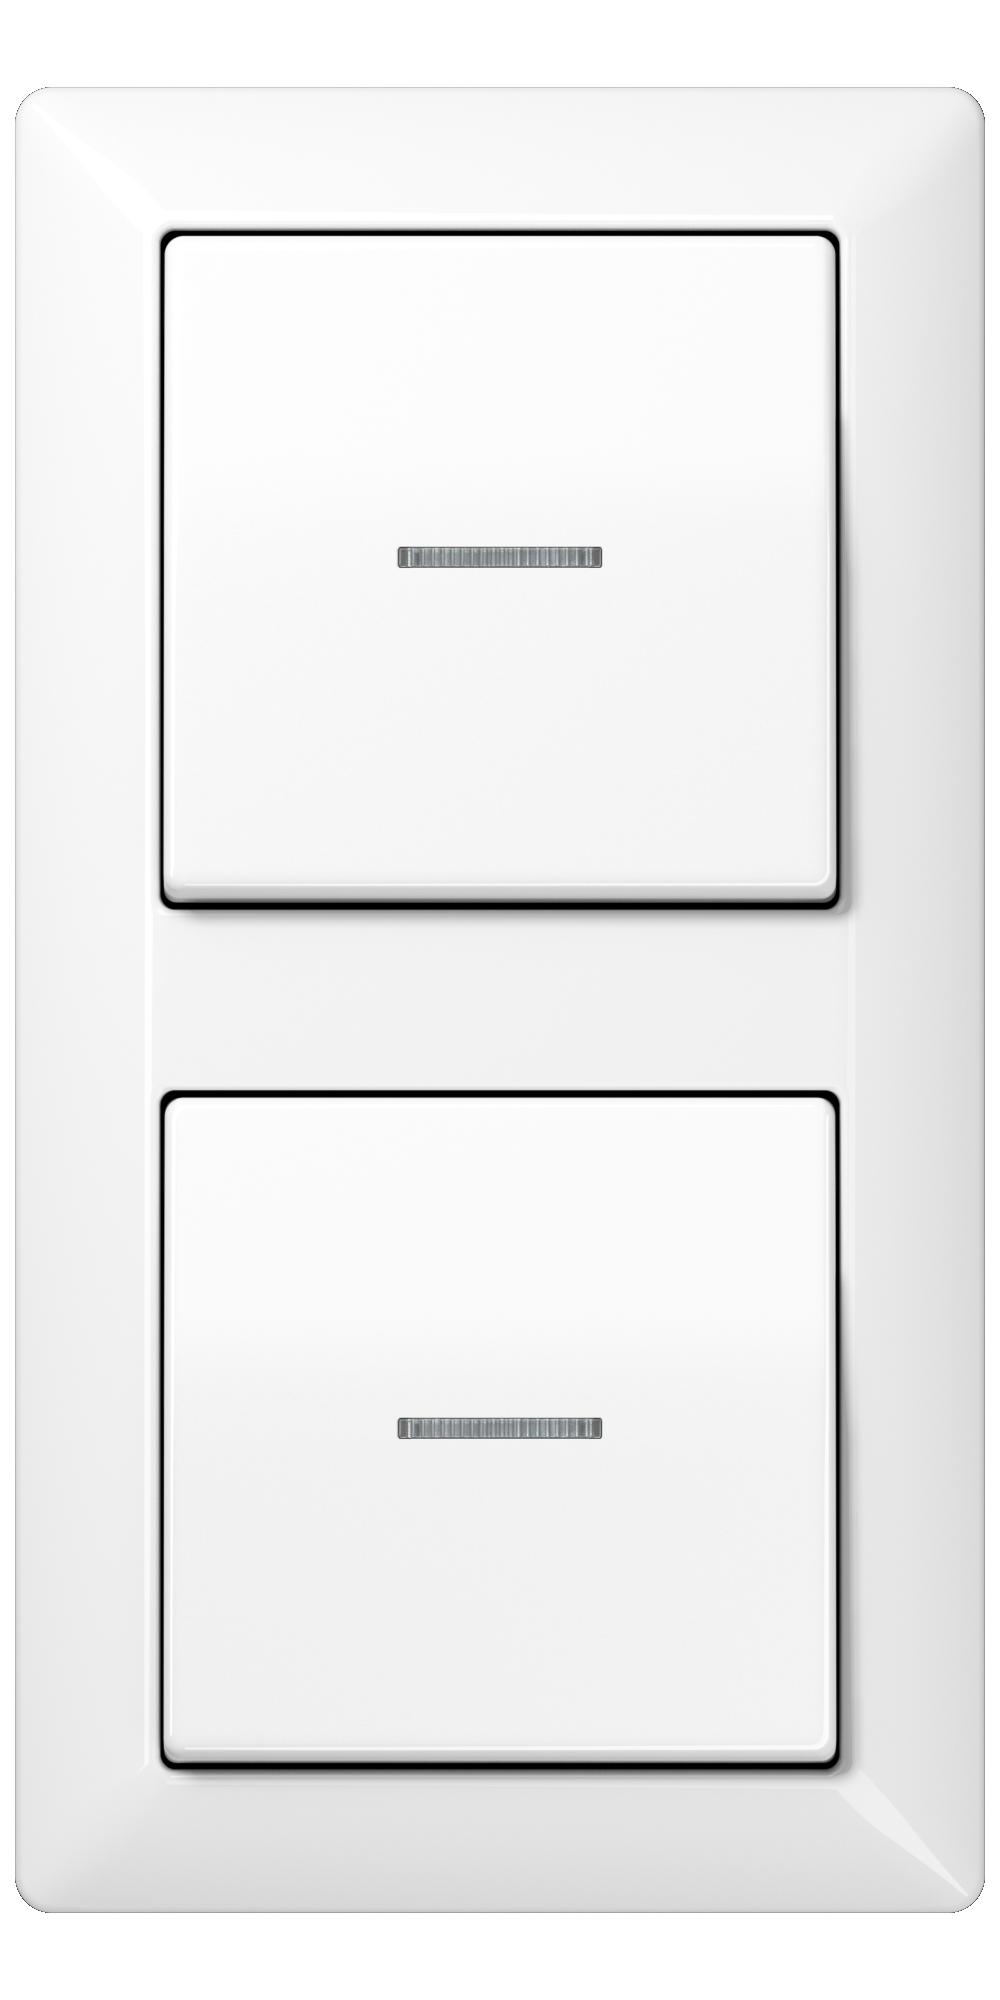 JUNG_AS500_white_switch-lense_switch-lense